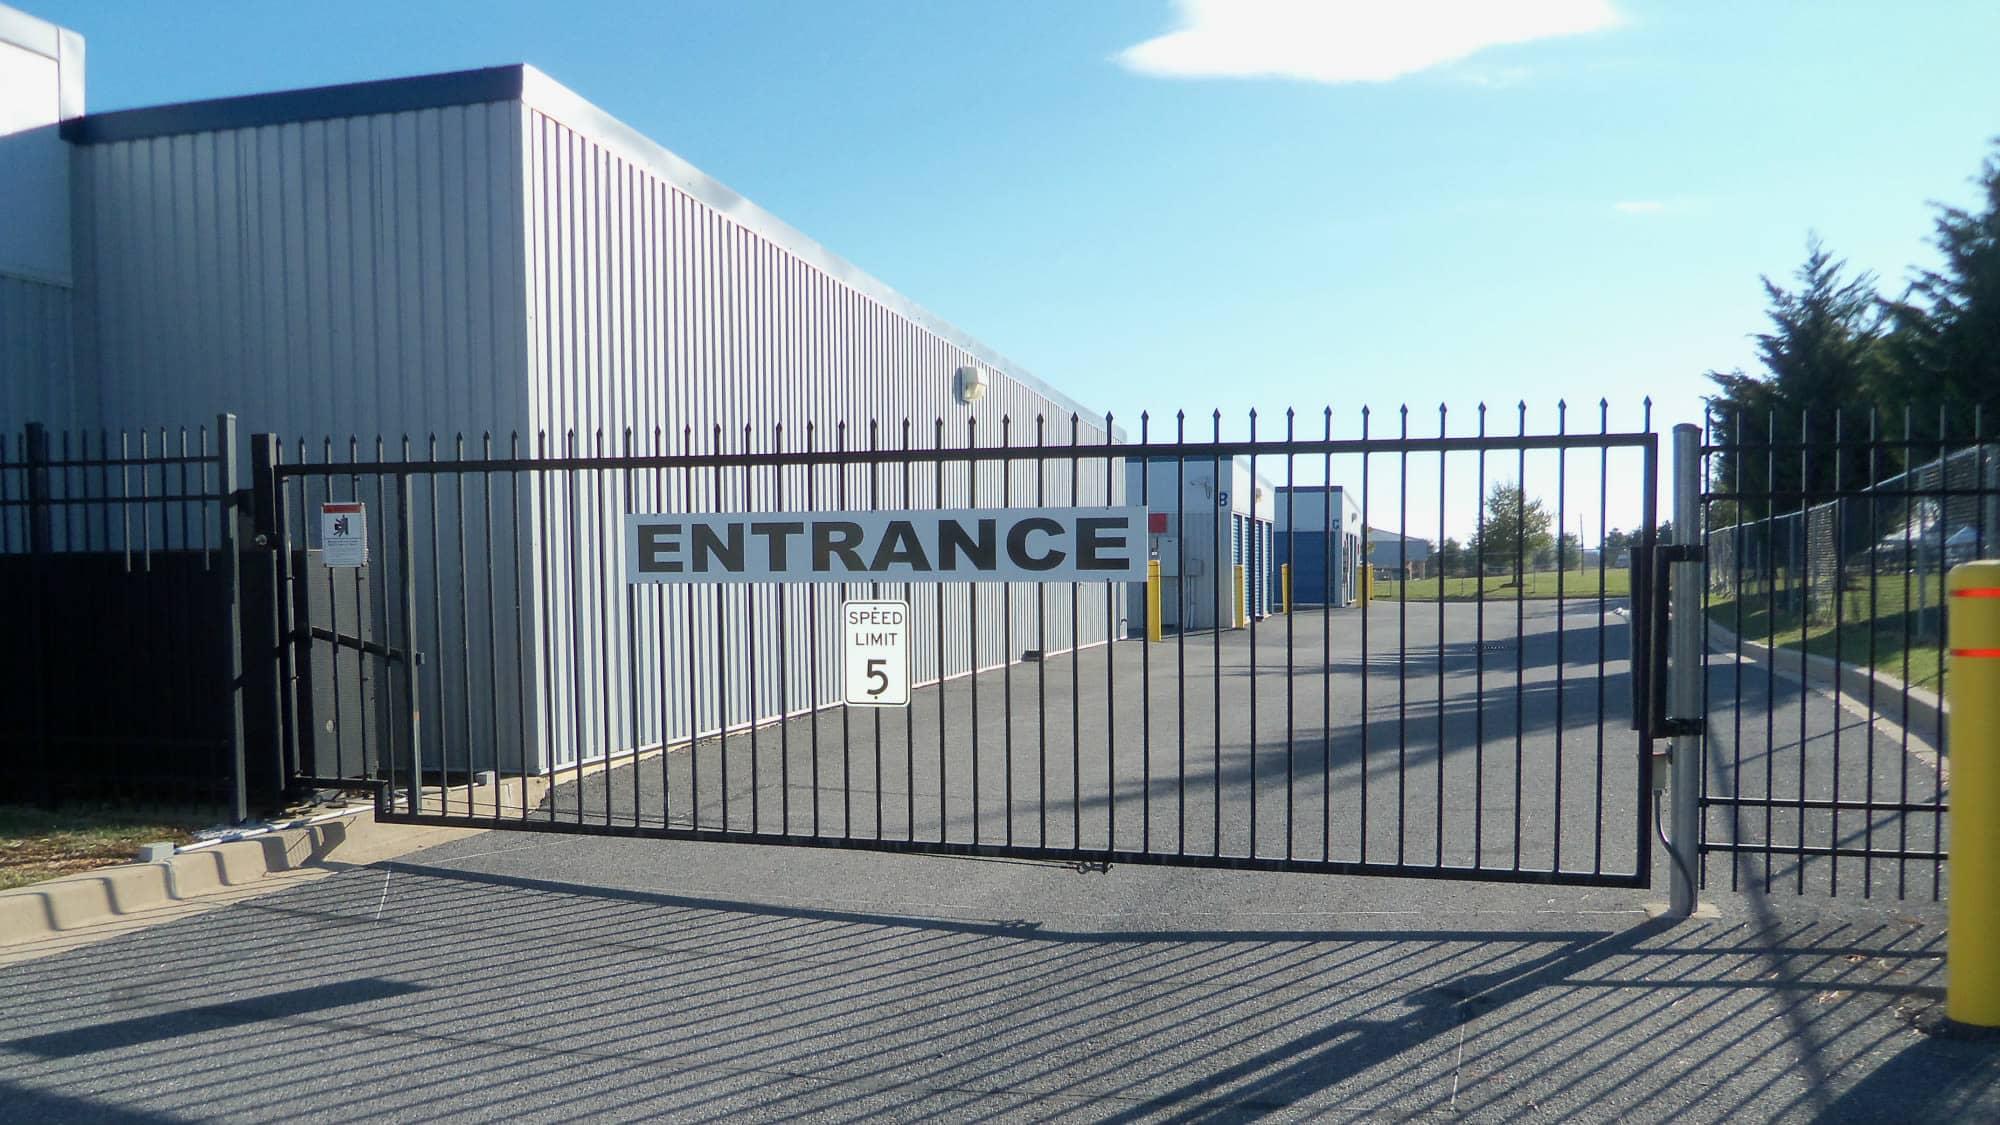 Entrance gate at Self Storage Plus in Walkersville, MD